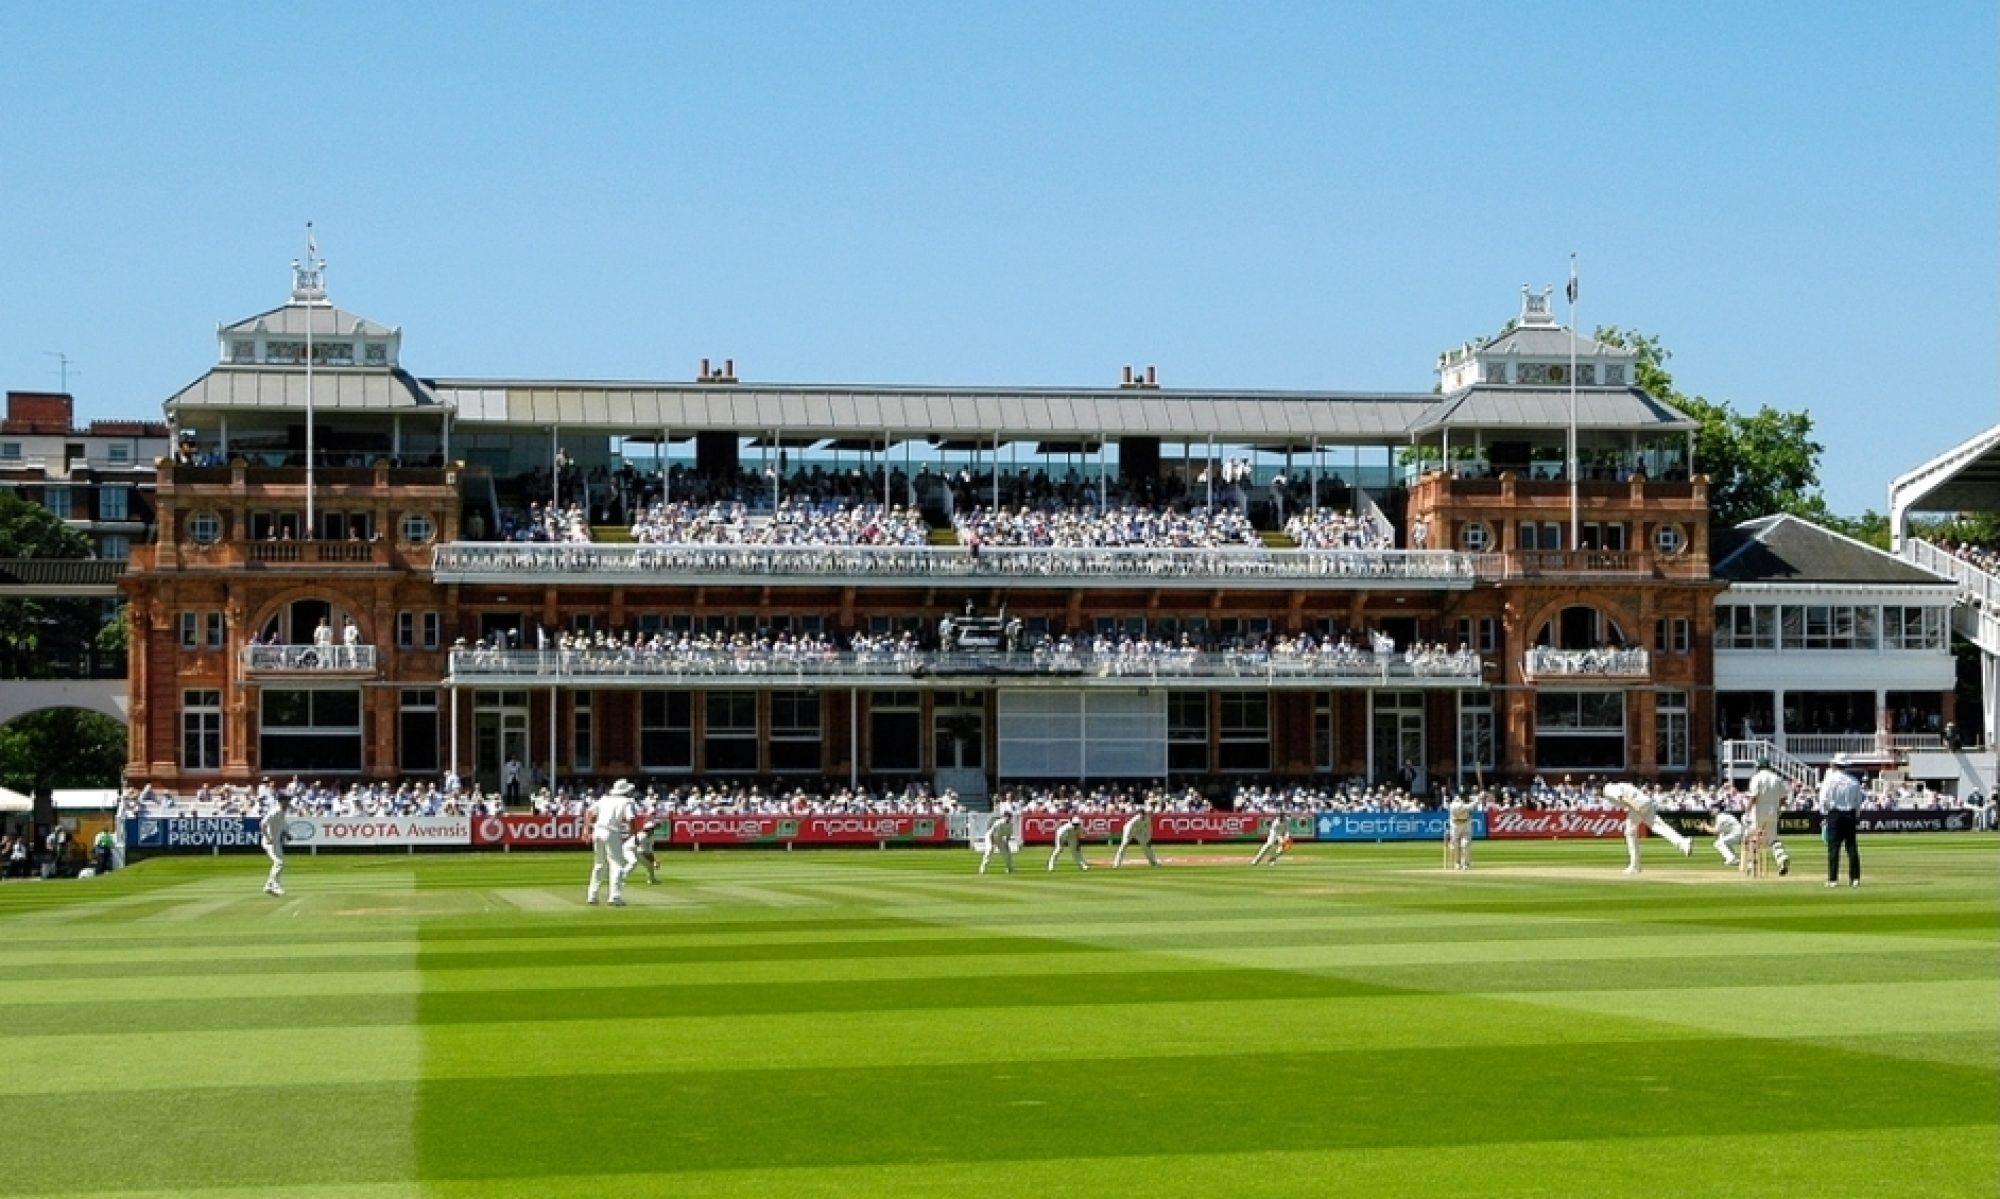 The Cricket Societies Association